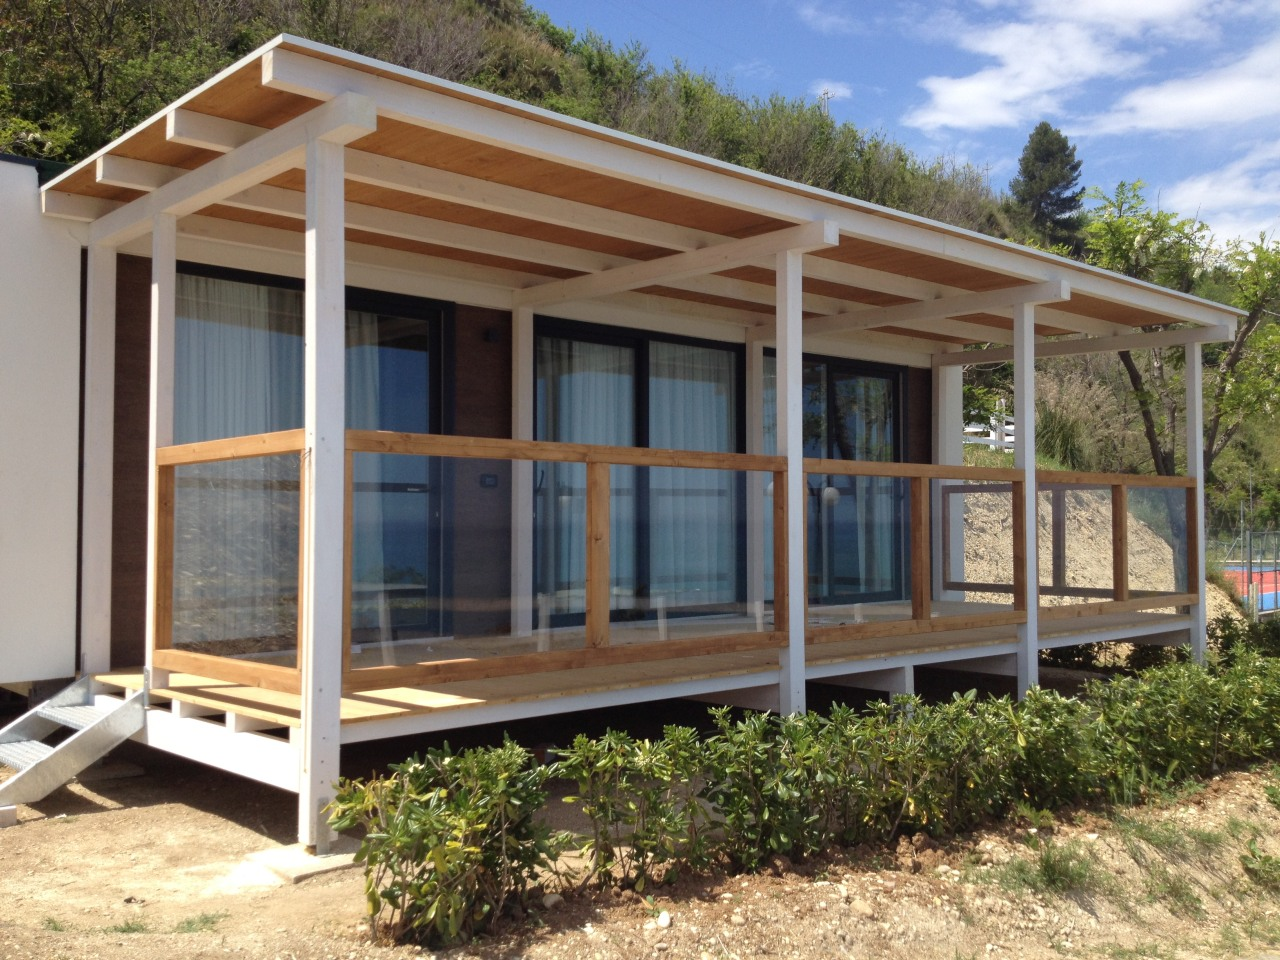 7. Camping Riva Verde - Altidona (FM)